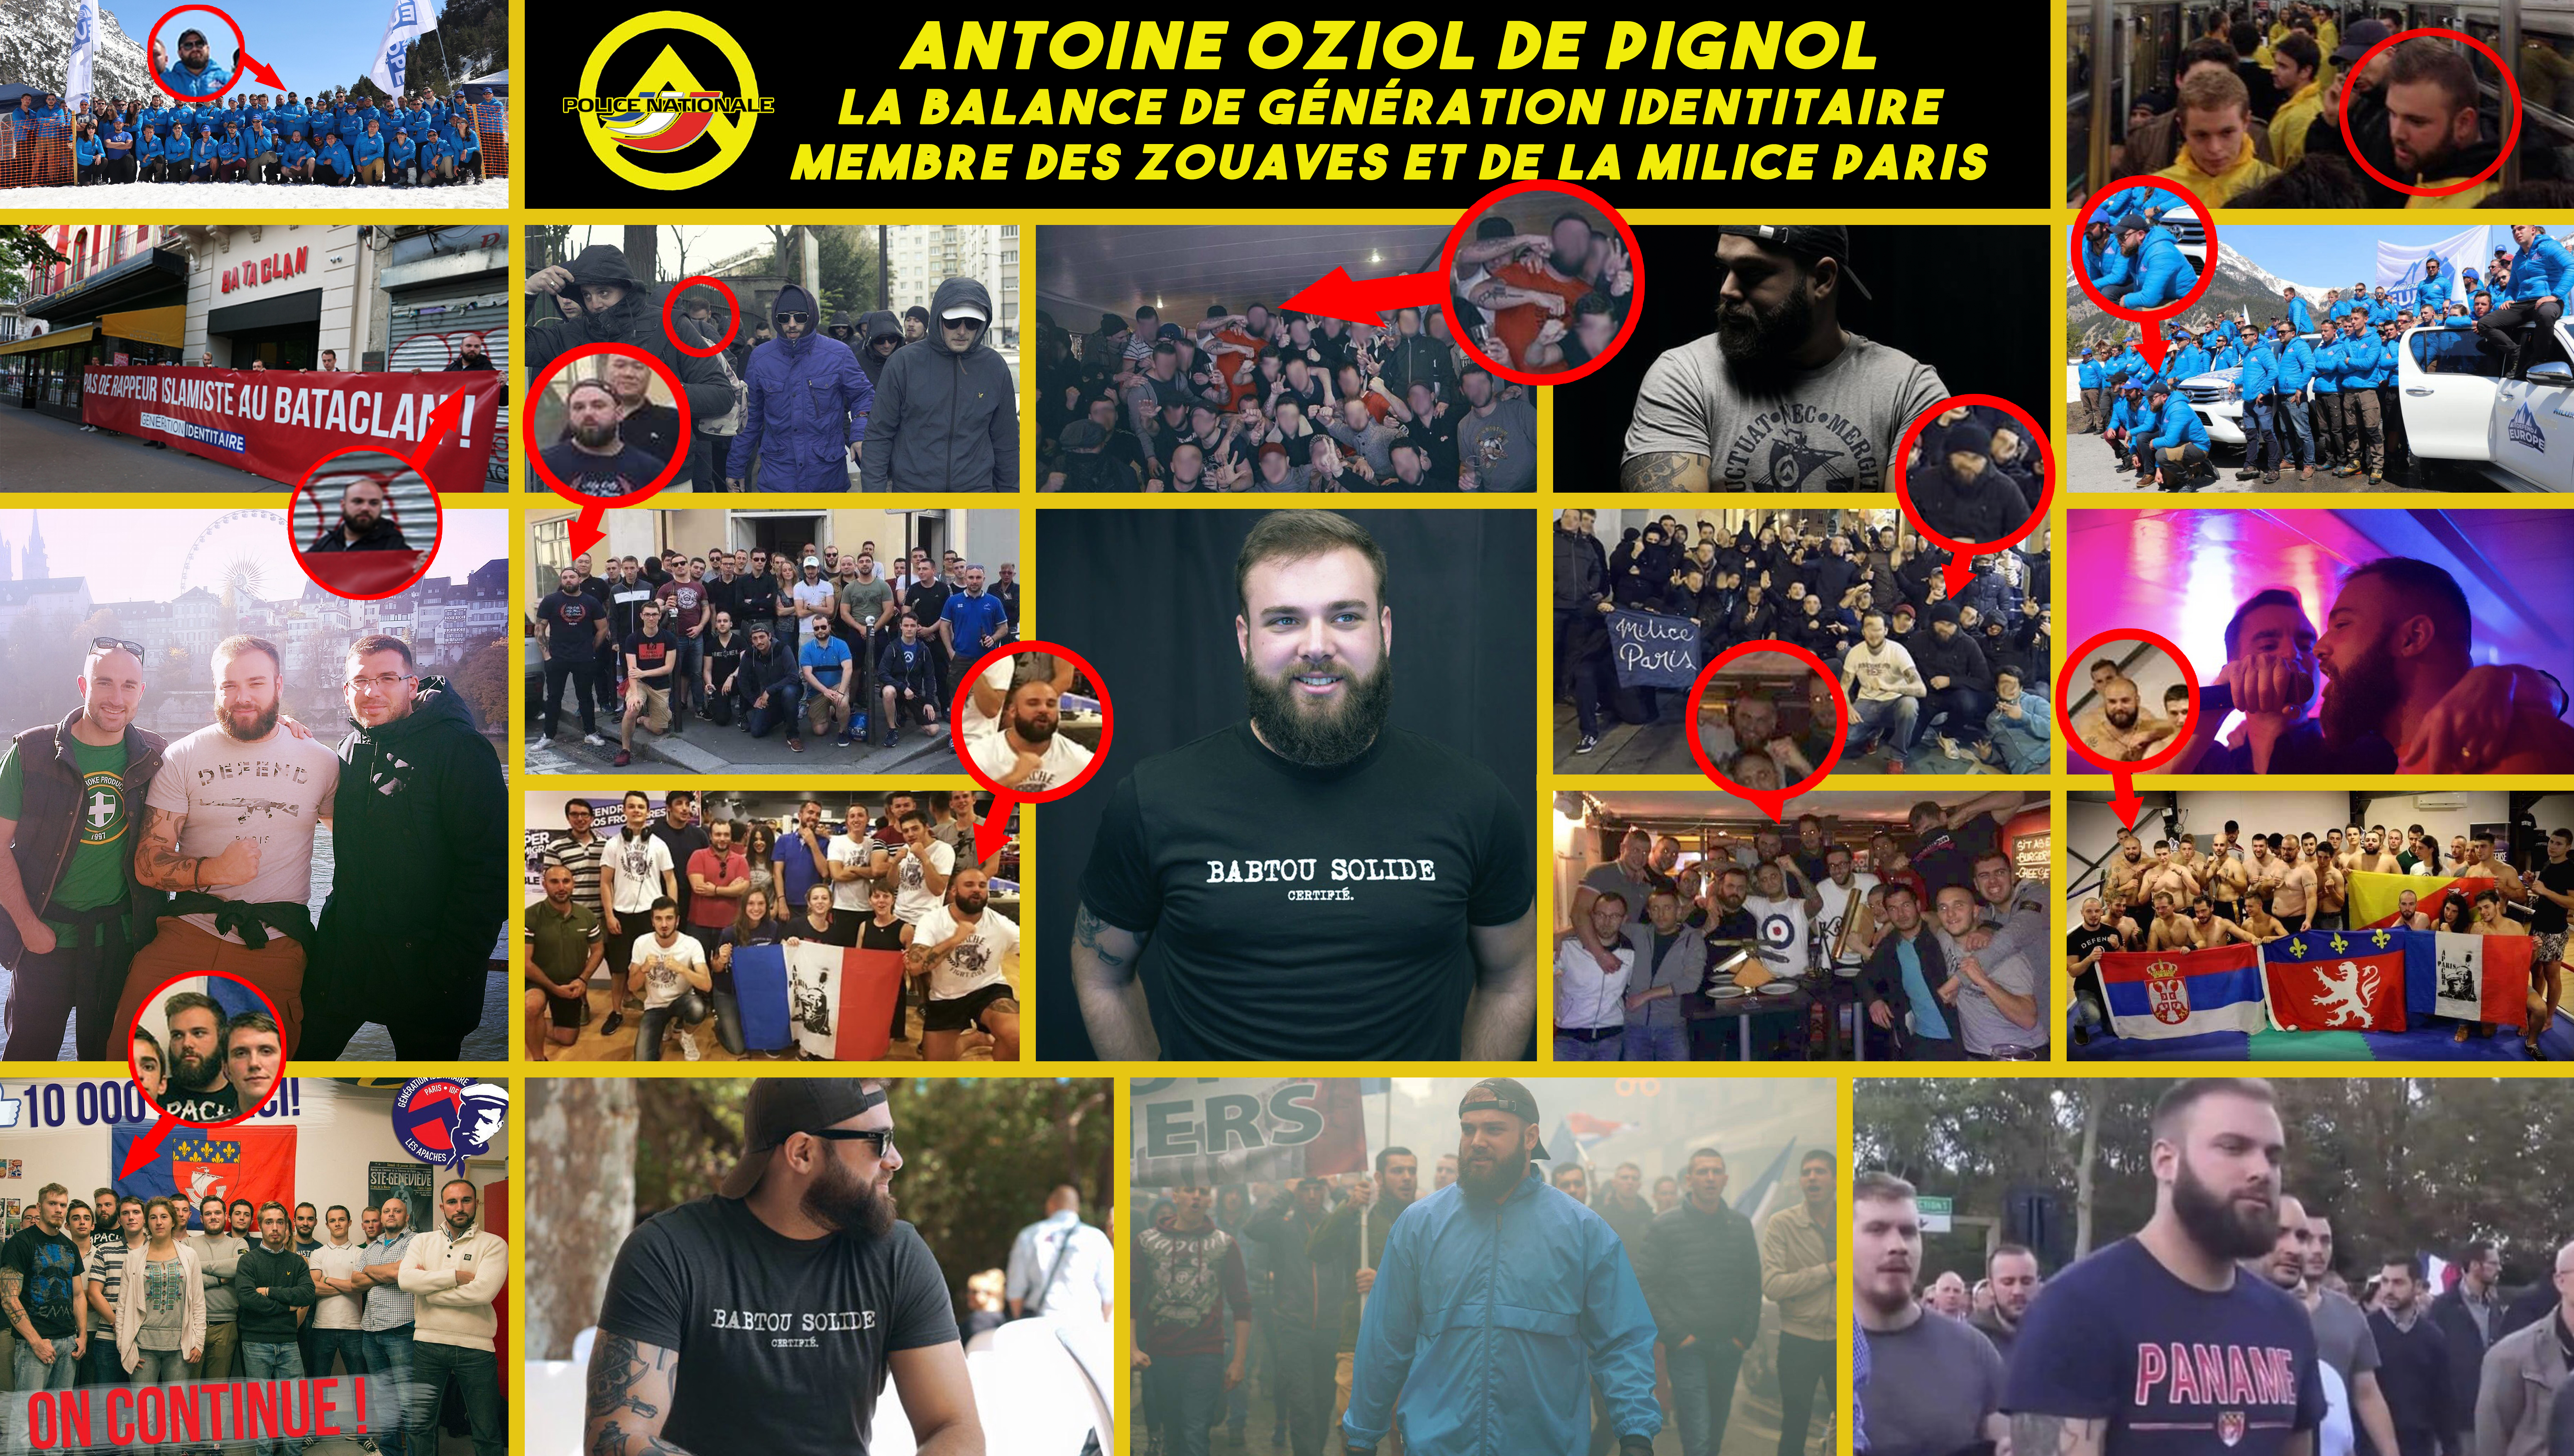 Qui est Antoine Oziol de Pignol, le fasciste qui porte plainte contre Antonin Bernanos ?